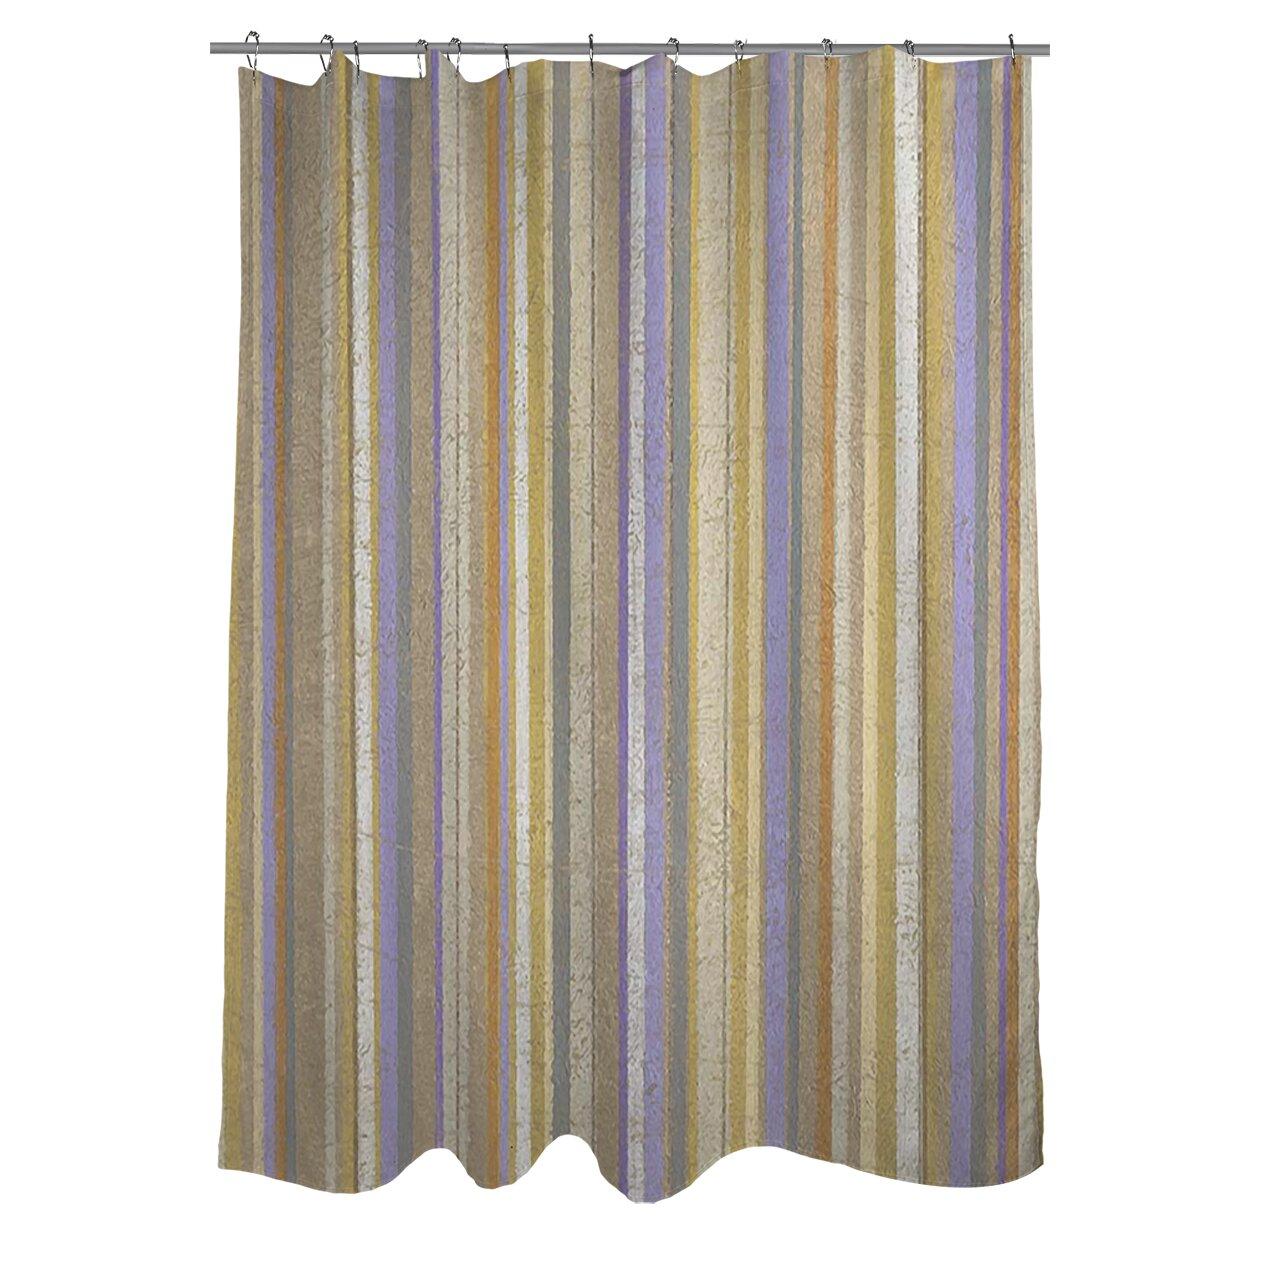 Shower Curtains Thumbprintz SKU: TBPZ3692